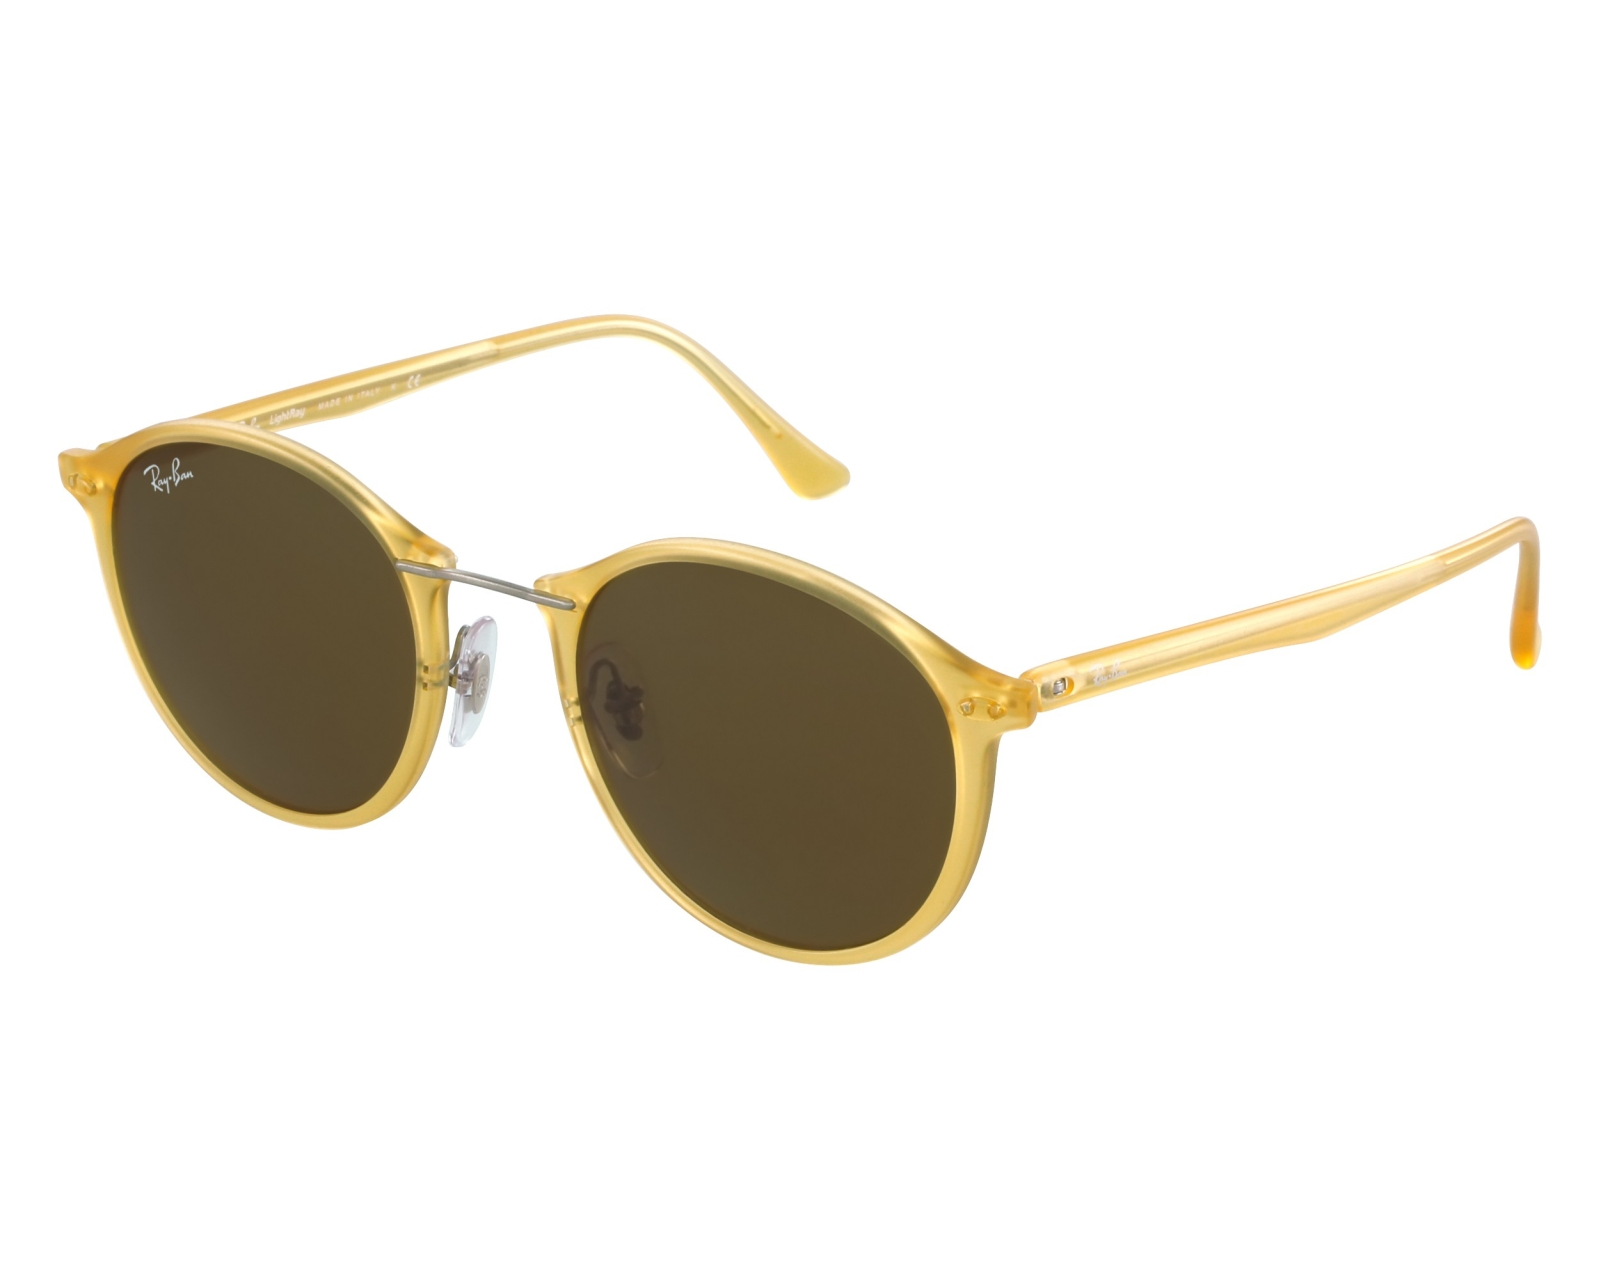 Ray-Ban Sunglasses RB-3576-N 90377J| Buy now and save 9%